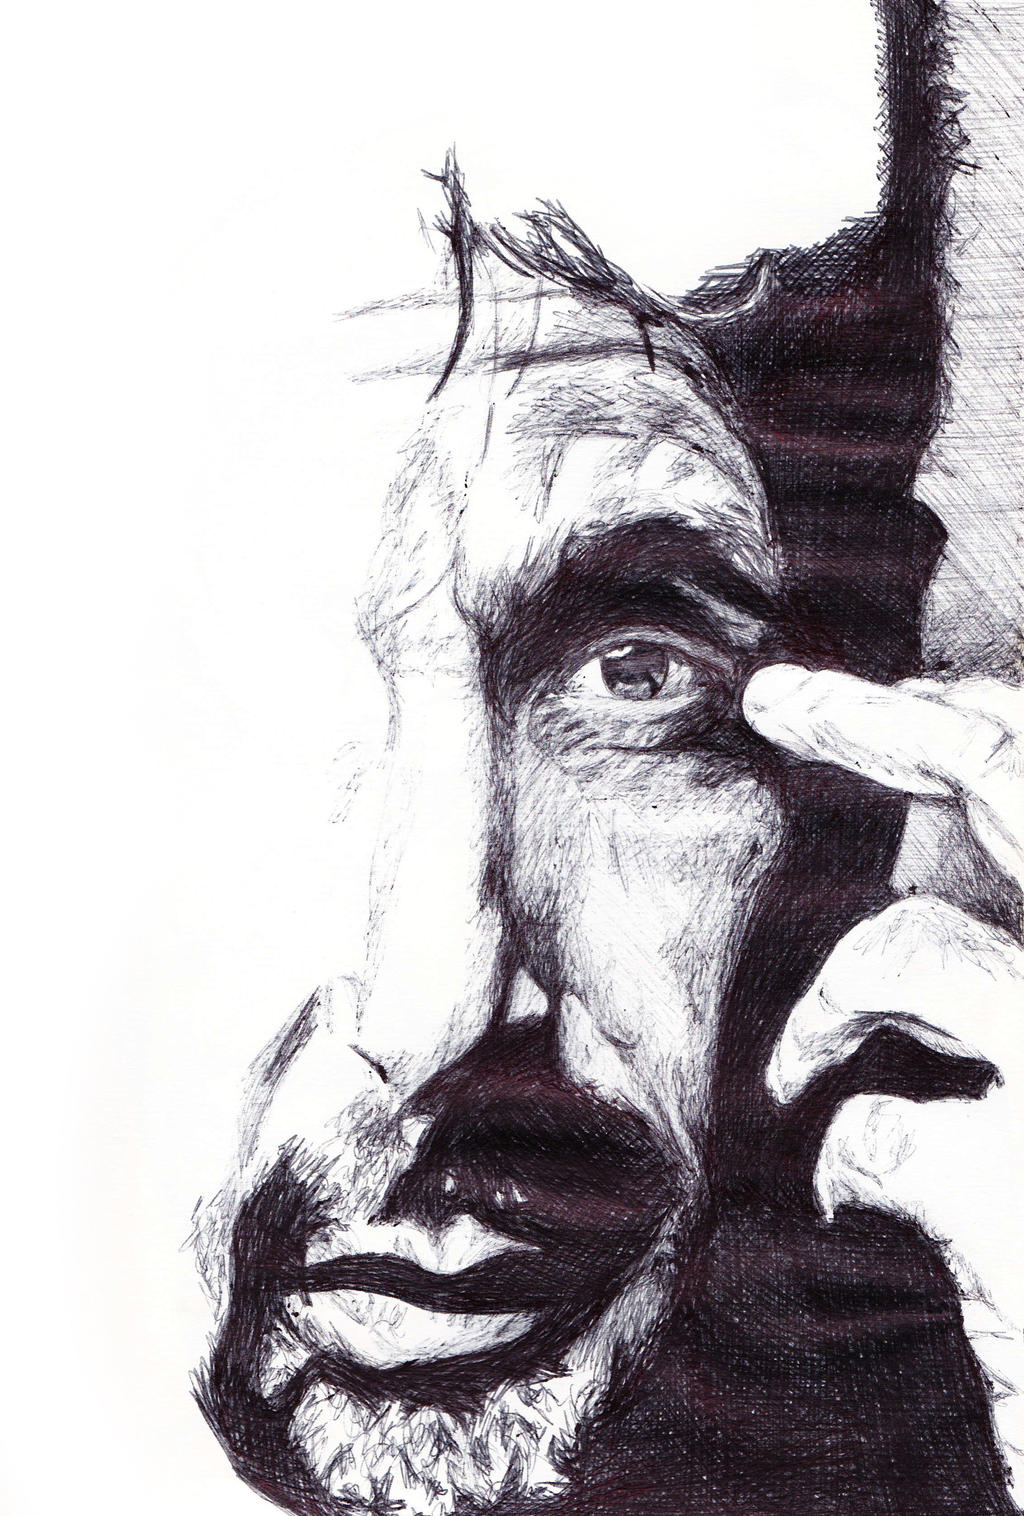 al pacino pen drawing by demoose21 on deviantart